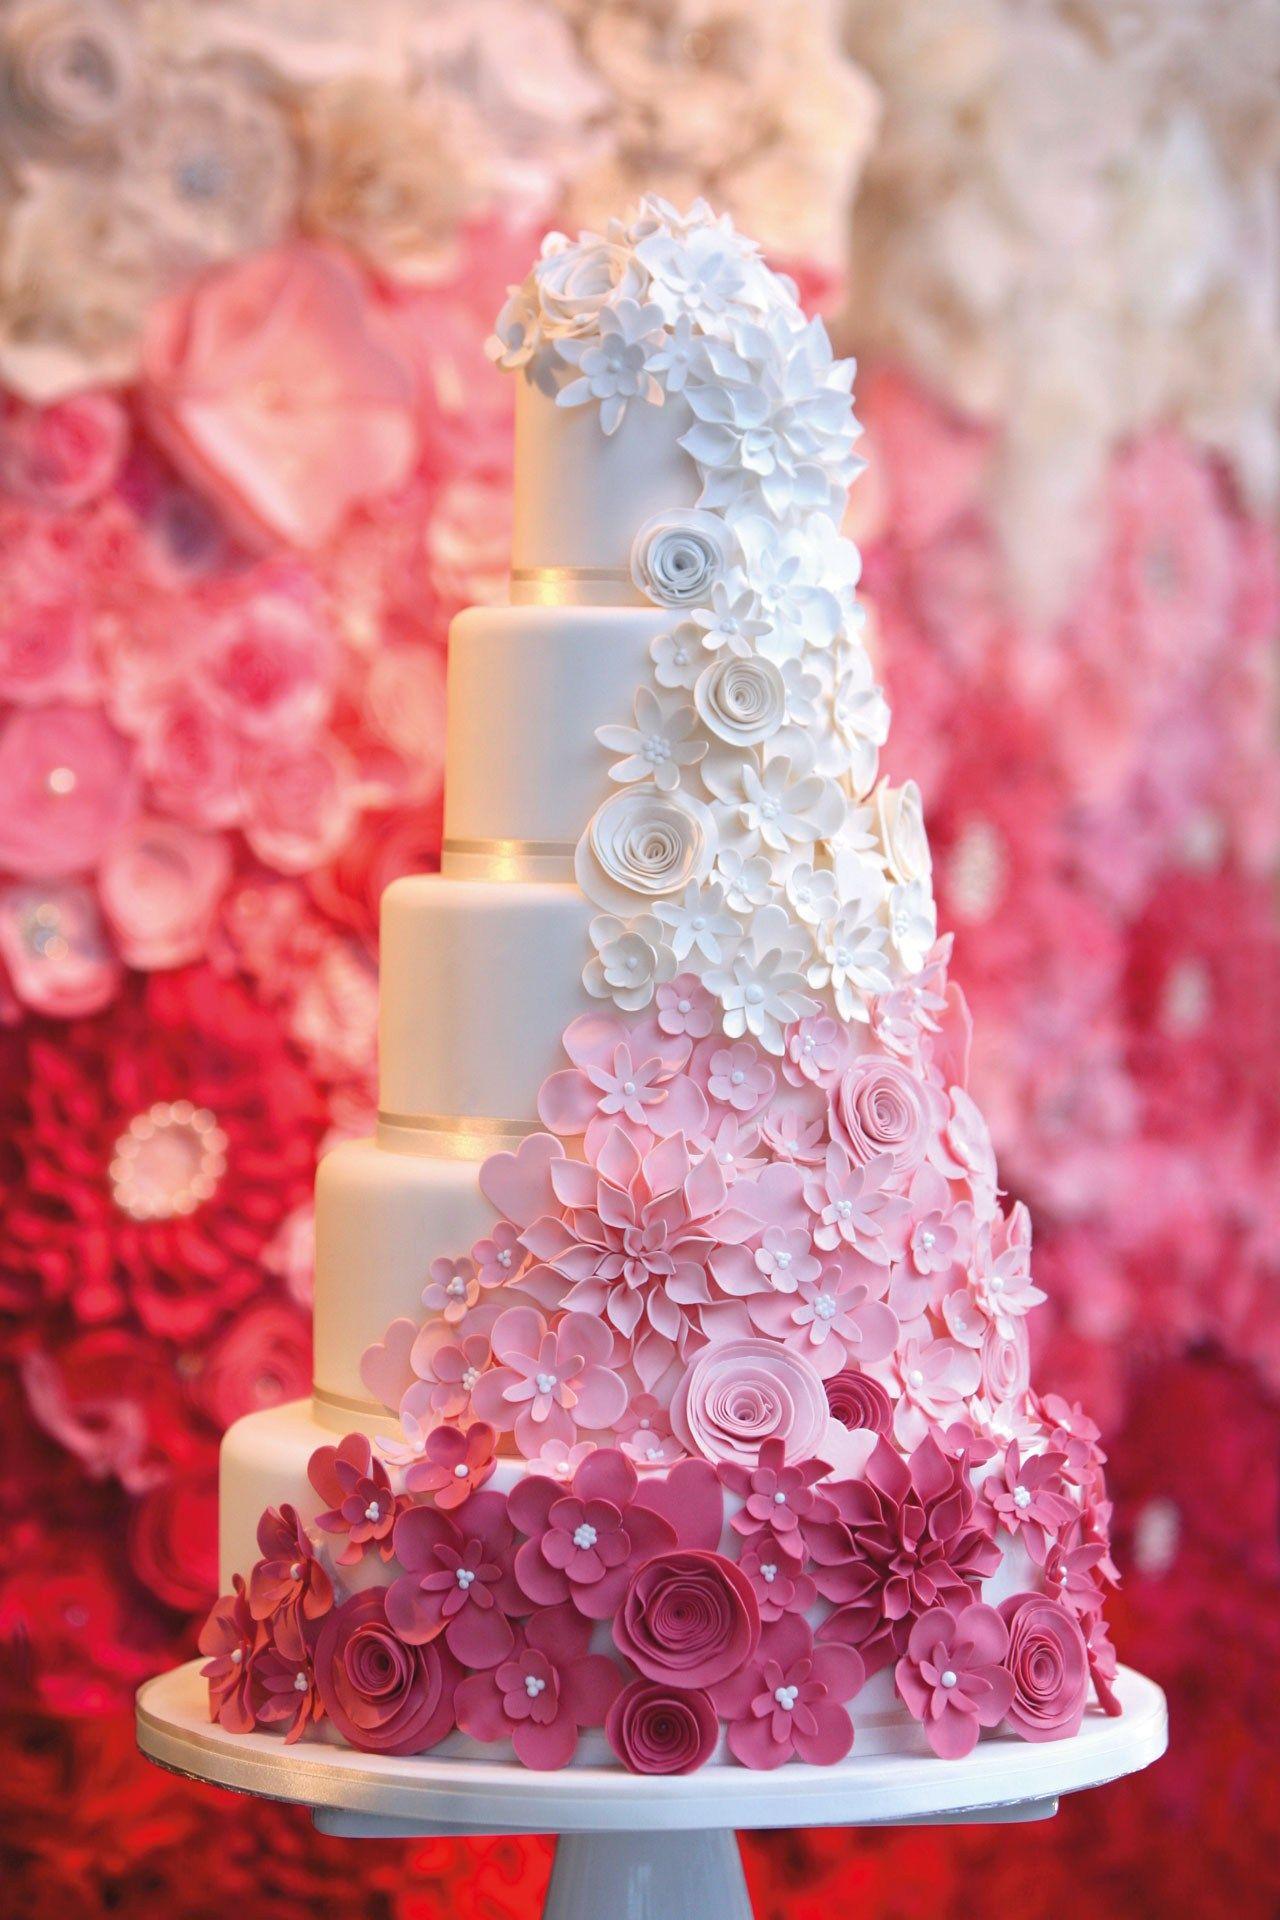 Ornate Cake | Weddings & Ideas | Pinterest | Wedding cake, Cake ...